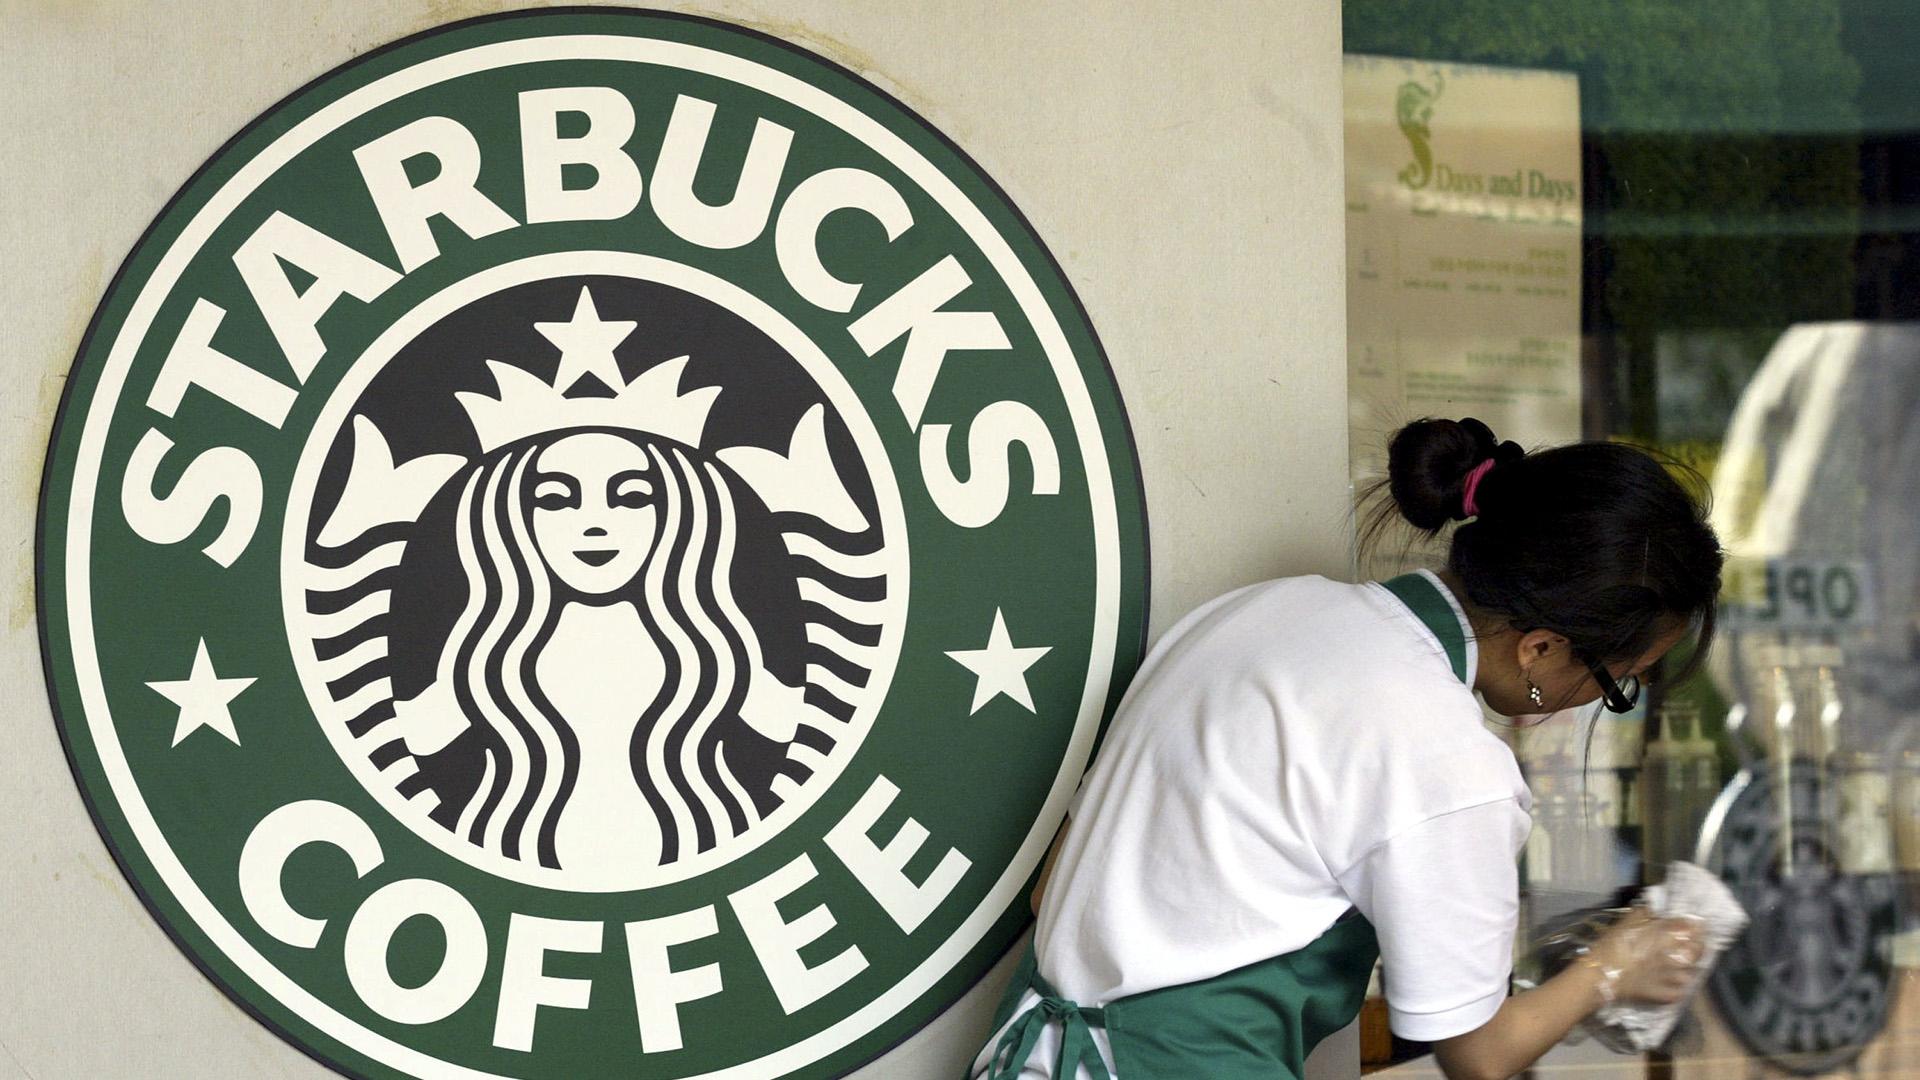 Starbucks To Sell Stake In Its South Korean Venture To Shinsegae Group